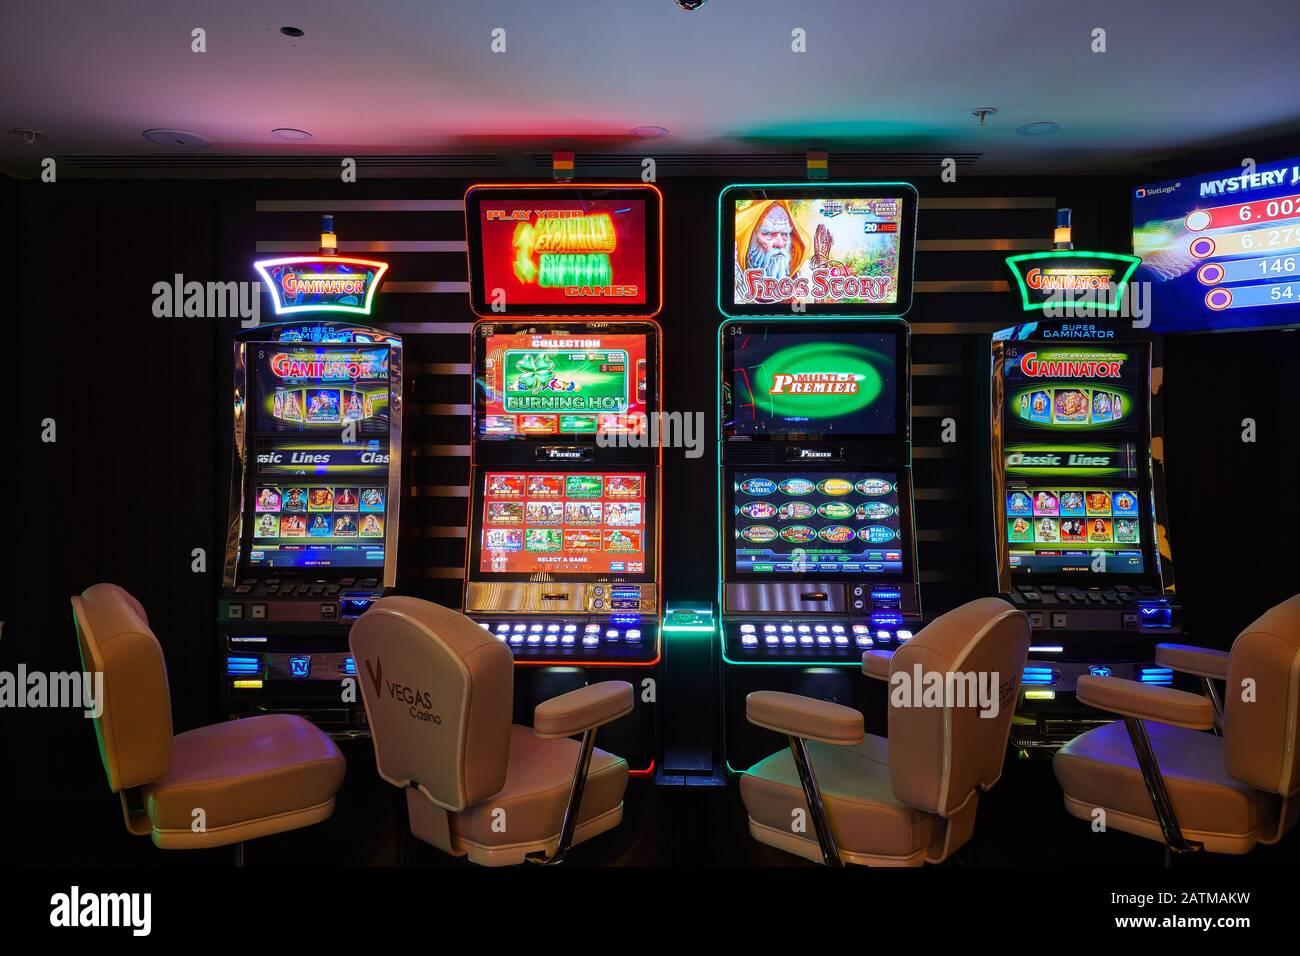 Geant casino place d'italie